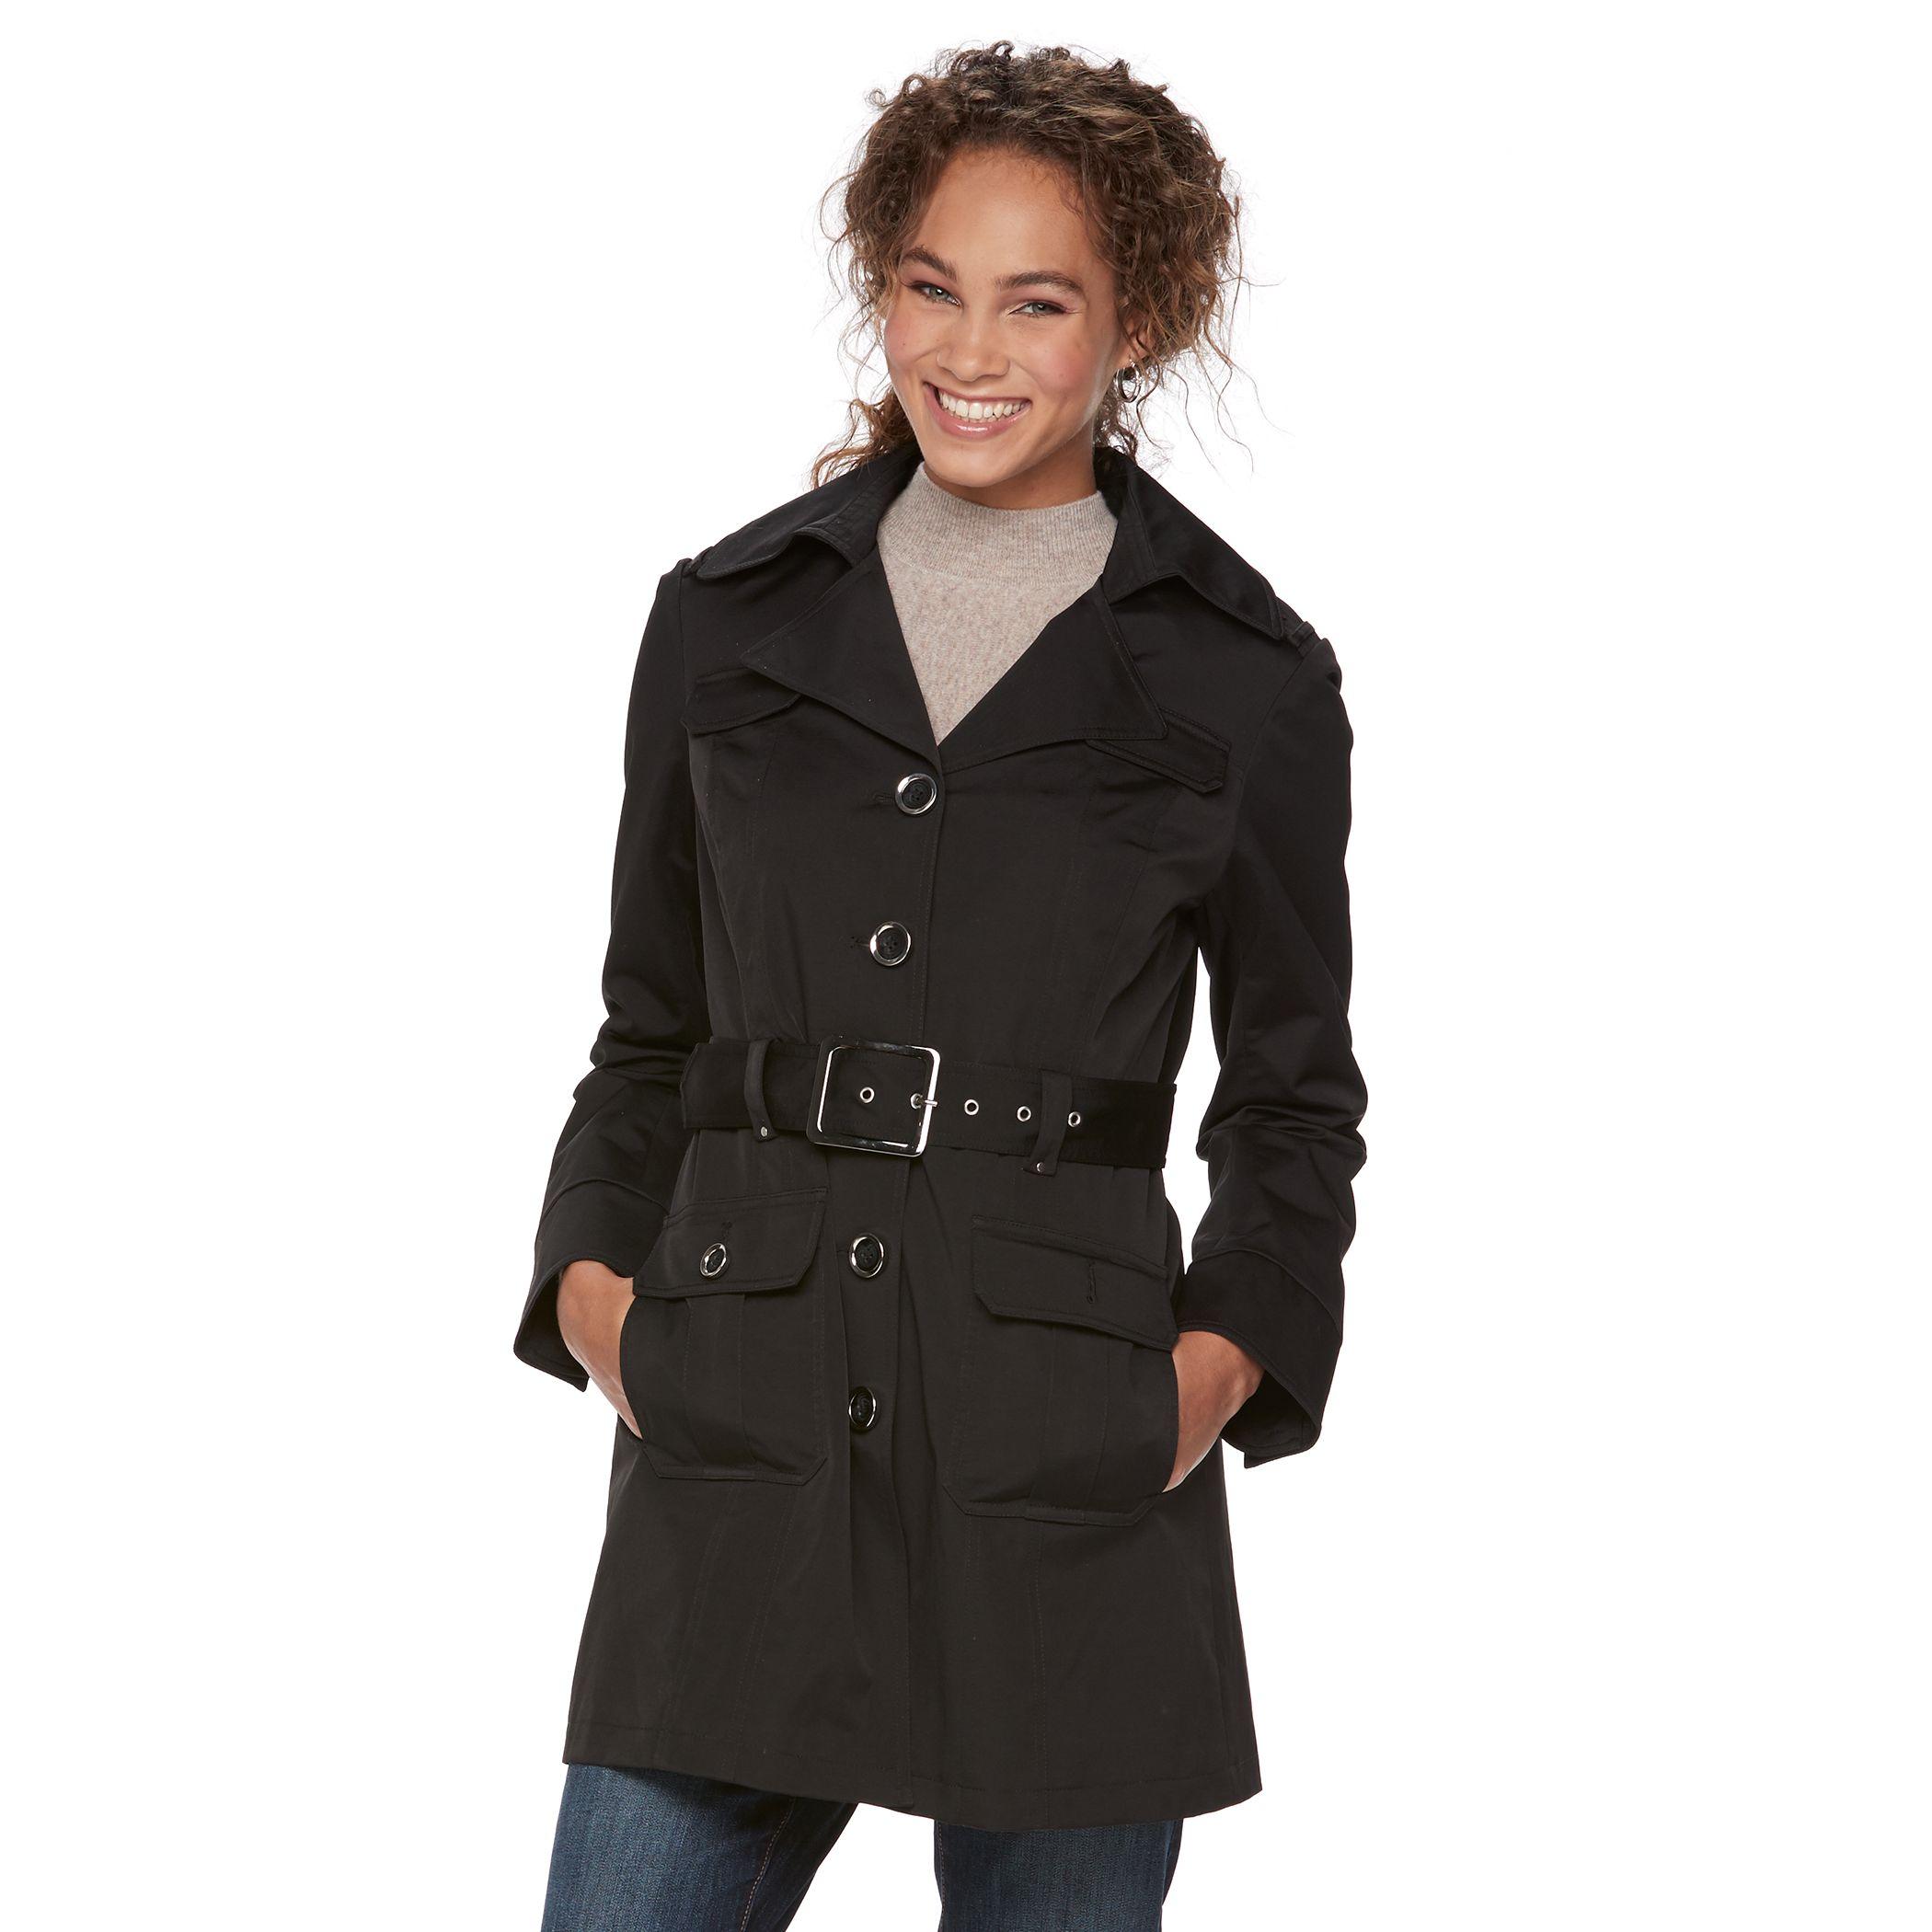 2907662_Black?wid=1000&hei=1000&op_sharpen=1 apt 9� military trench coat,Kohls Apt 9 Womens Clothing